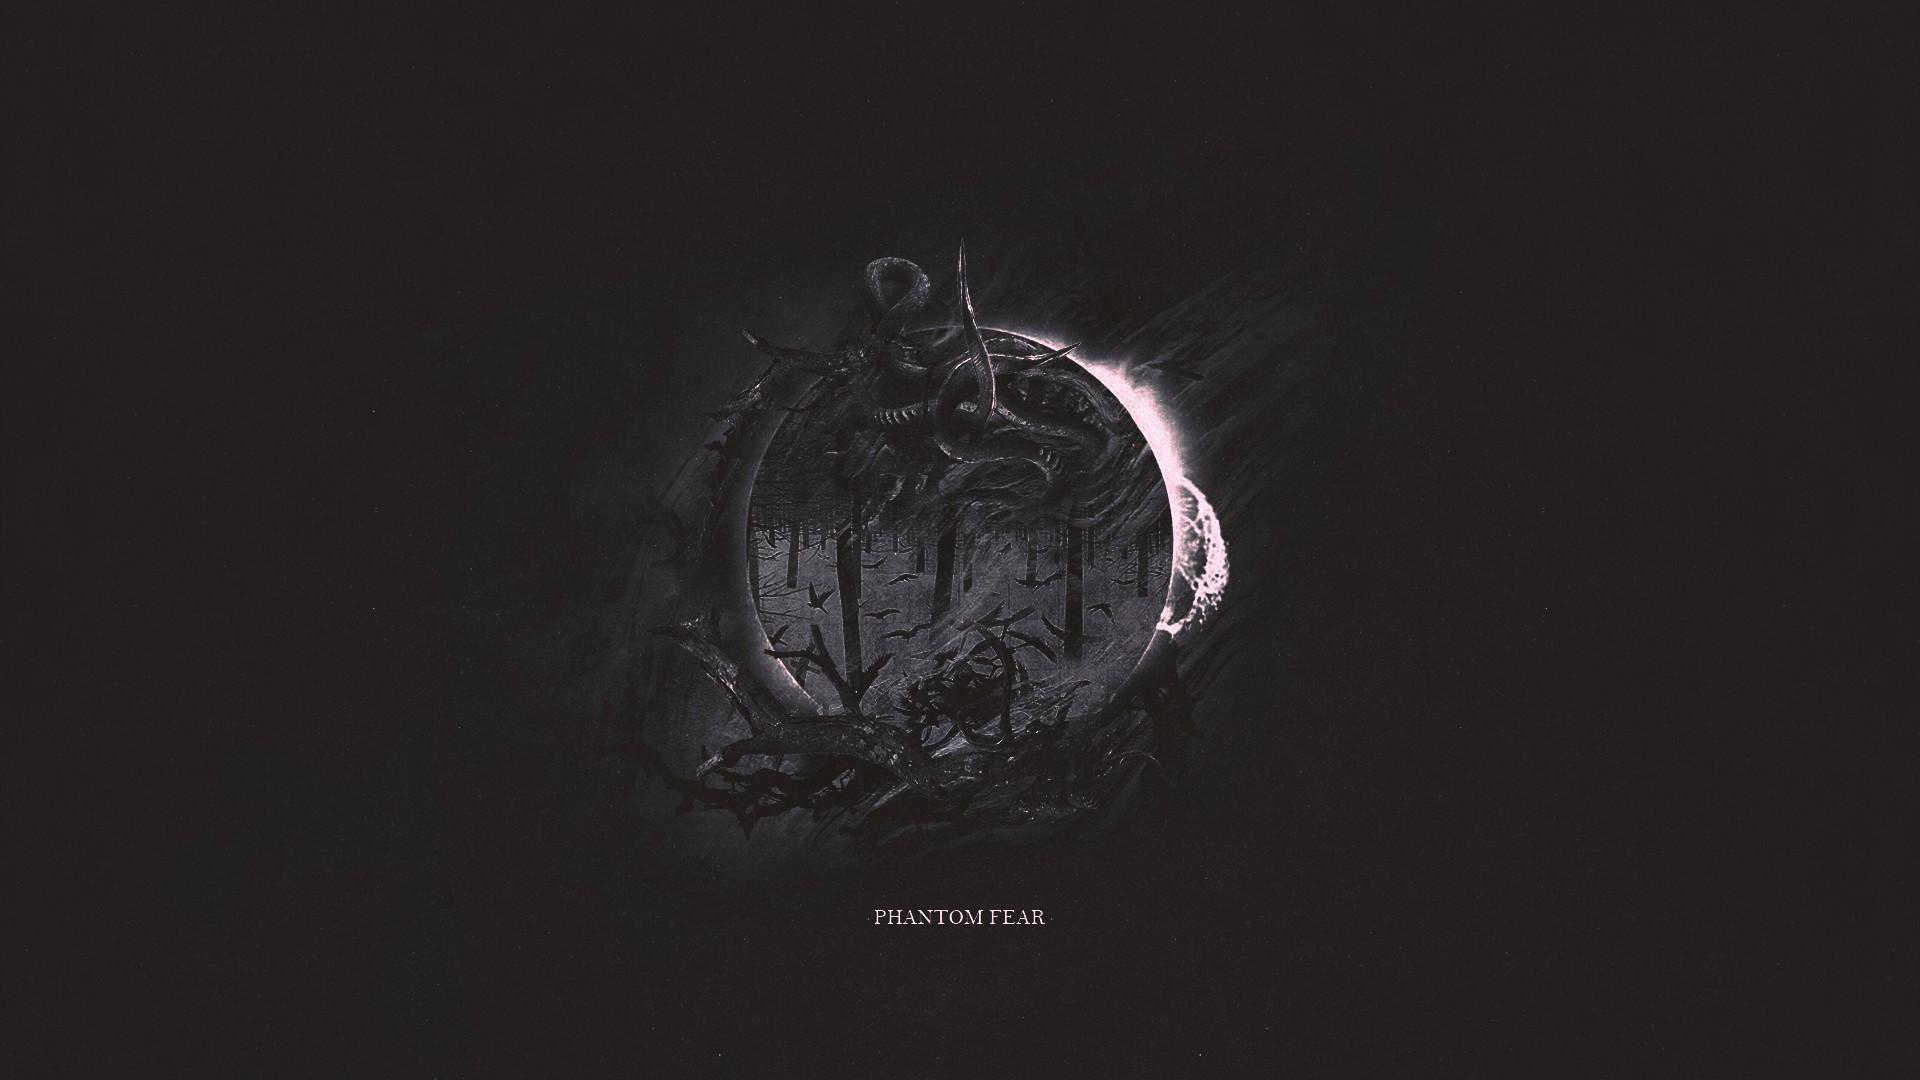 General hardcore metal music God's Not Dead